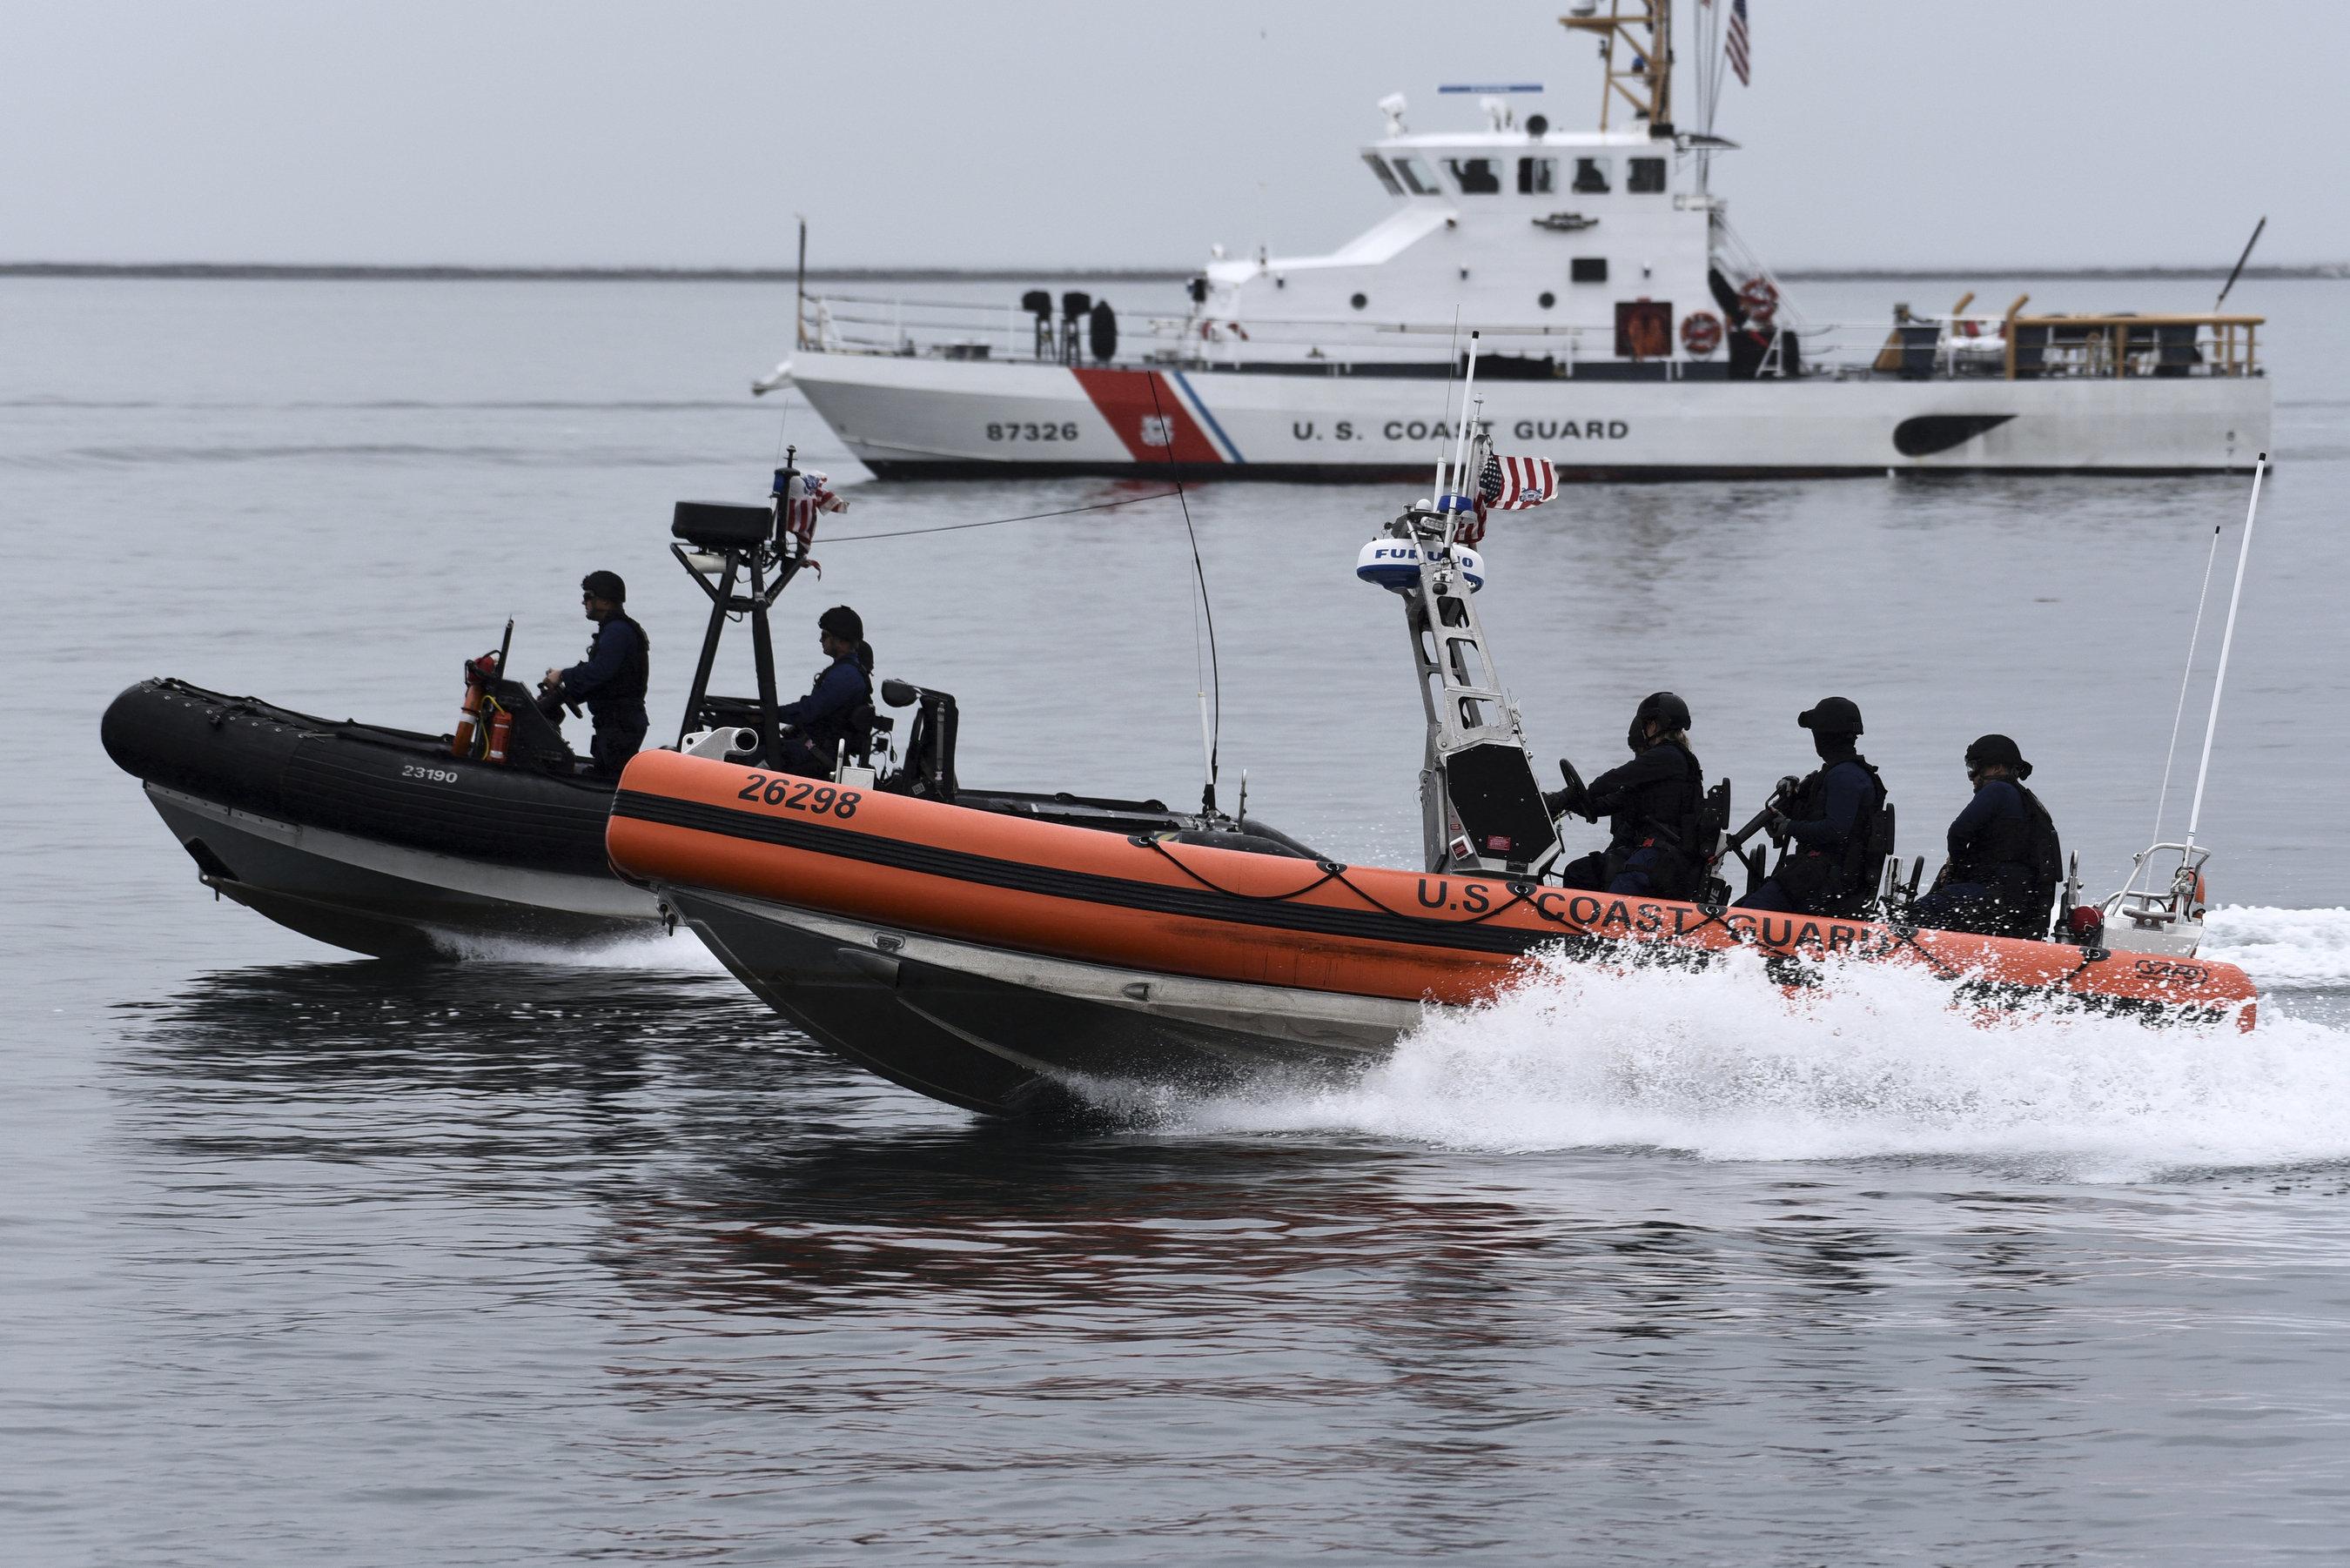 U.S. Coast Guard Still Feeling Government Shutdown Effects, Officials